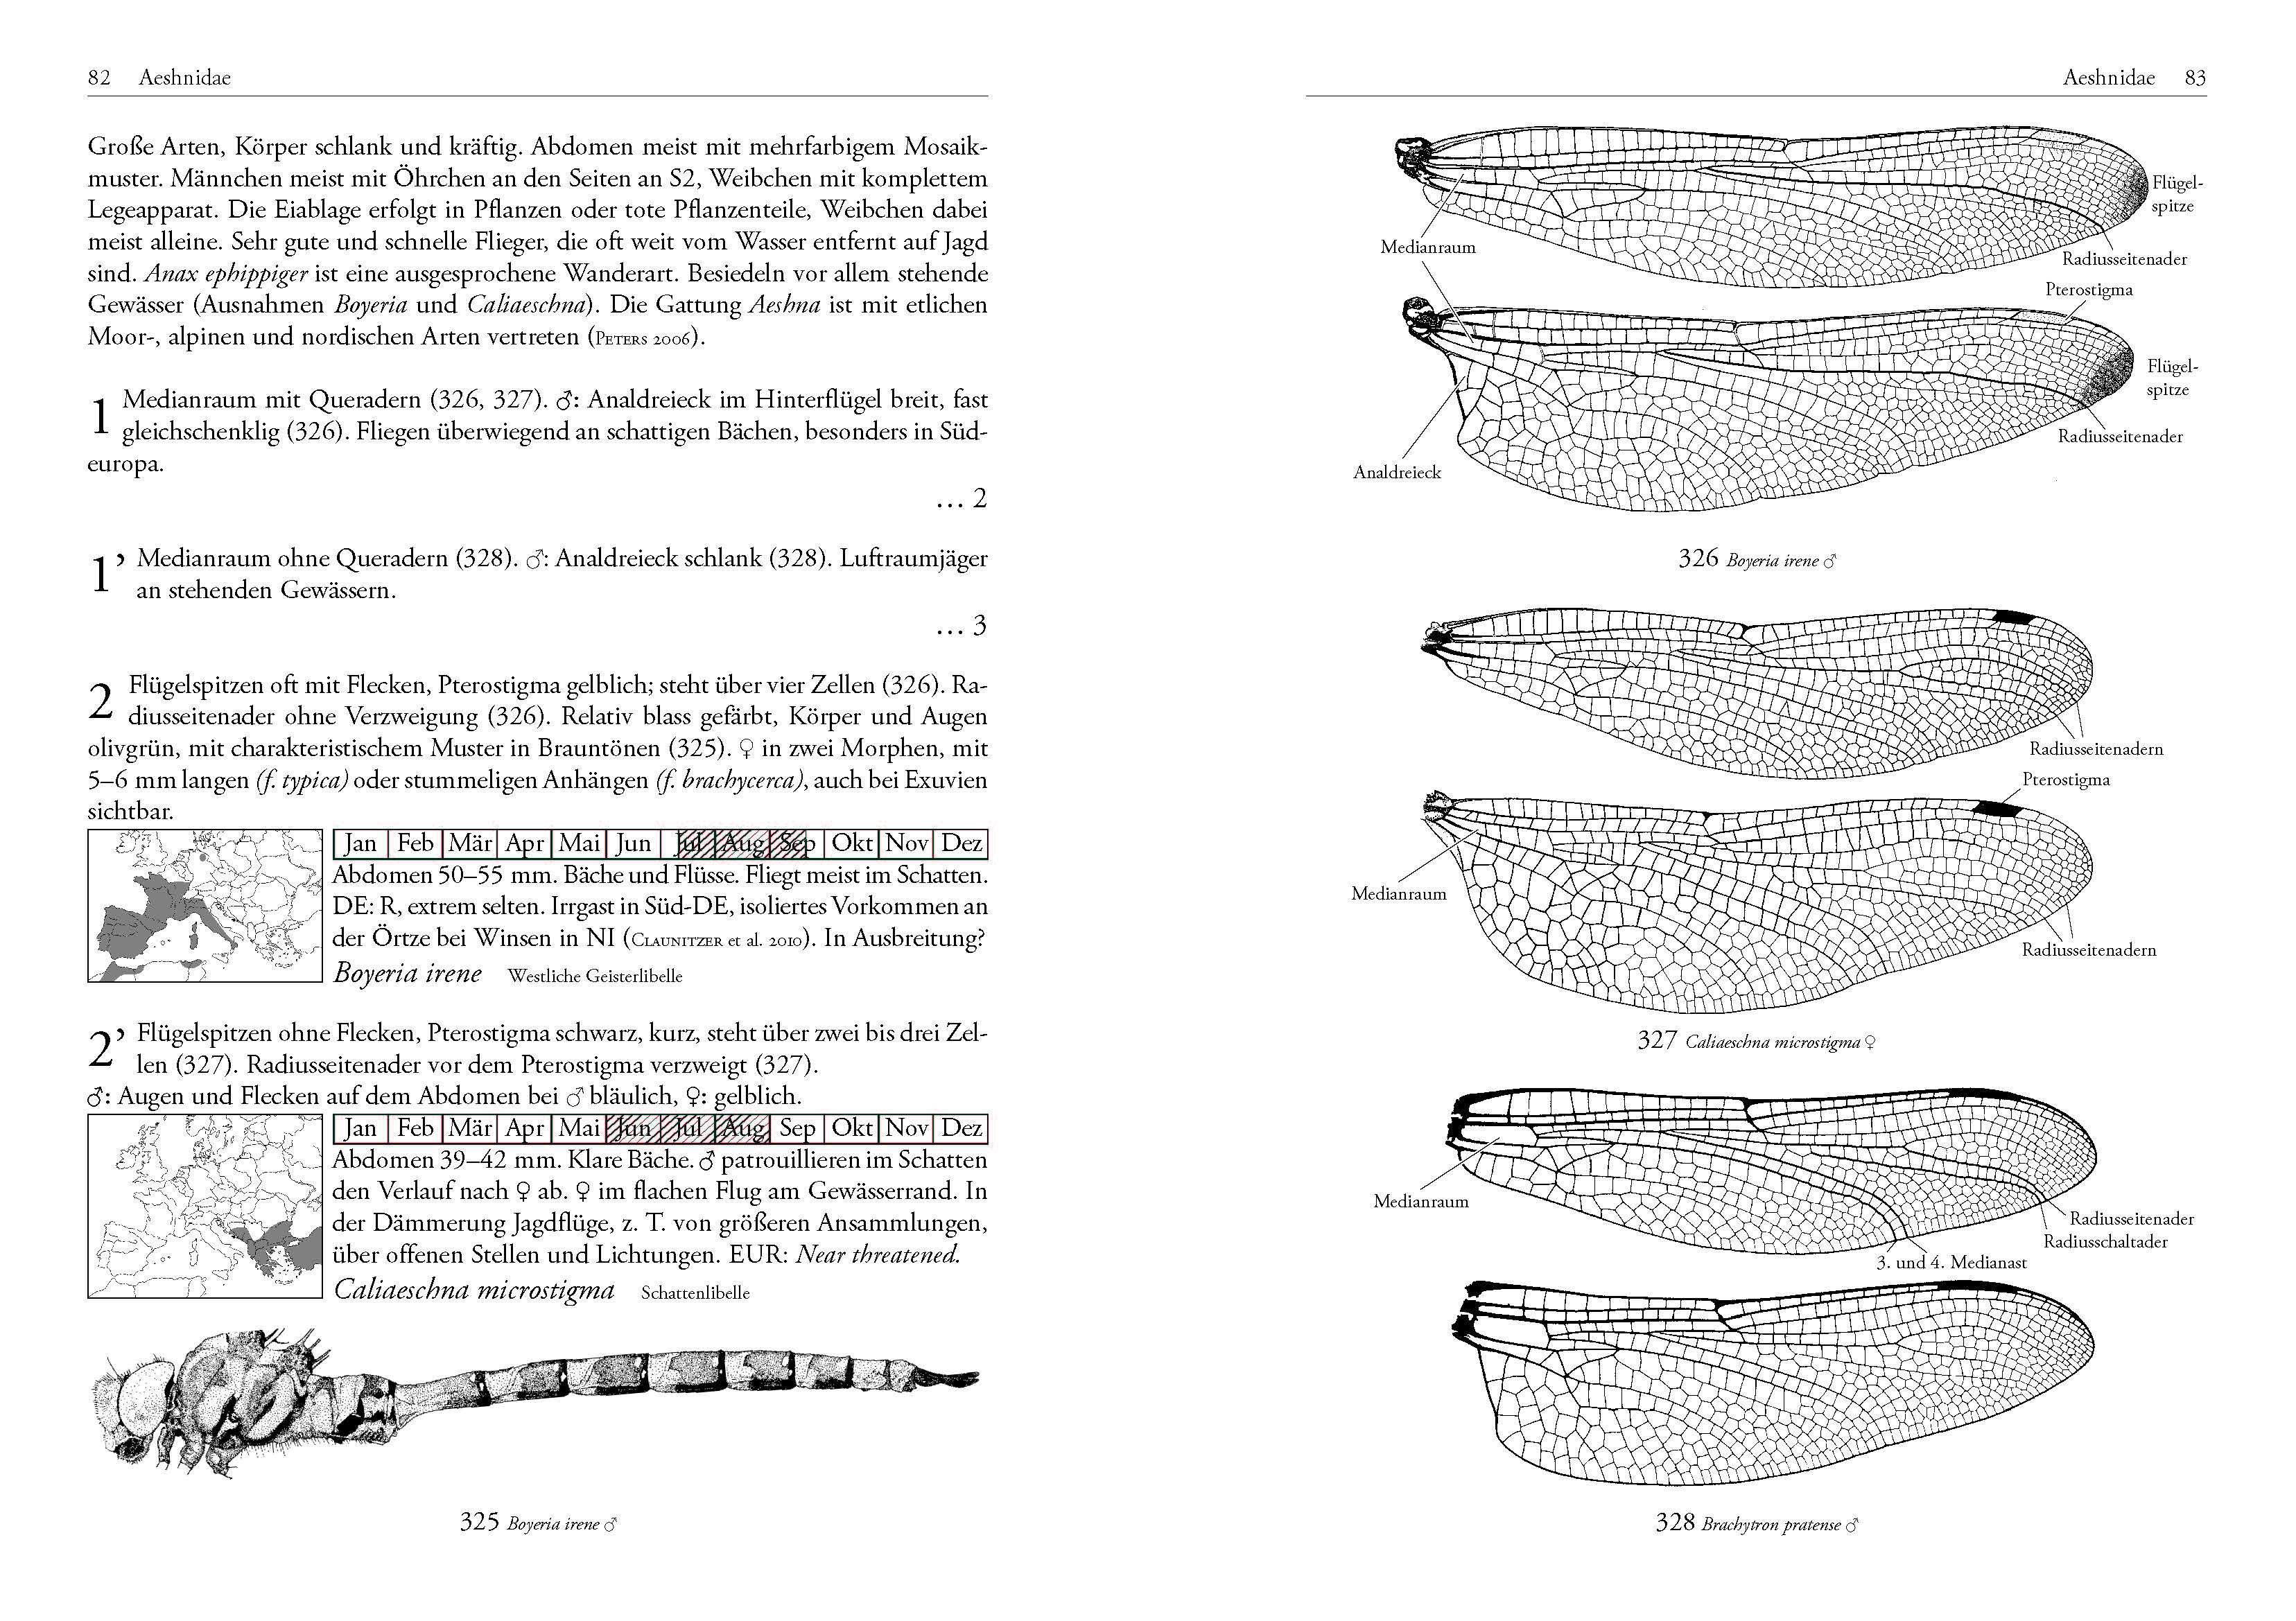 Leseprobe - DJN Libellen-Bestimmungsschlüssel Lehmann/Nüß, Seite 82/83